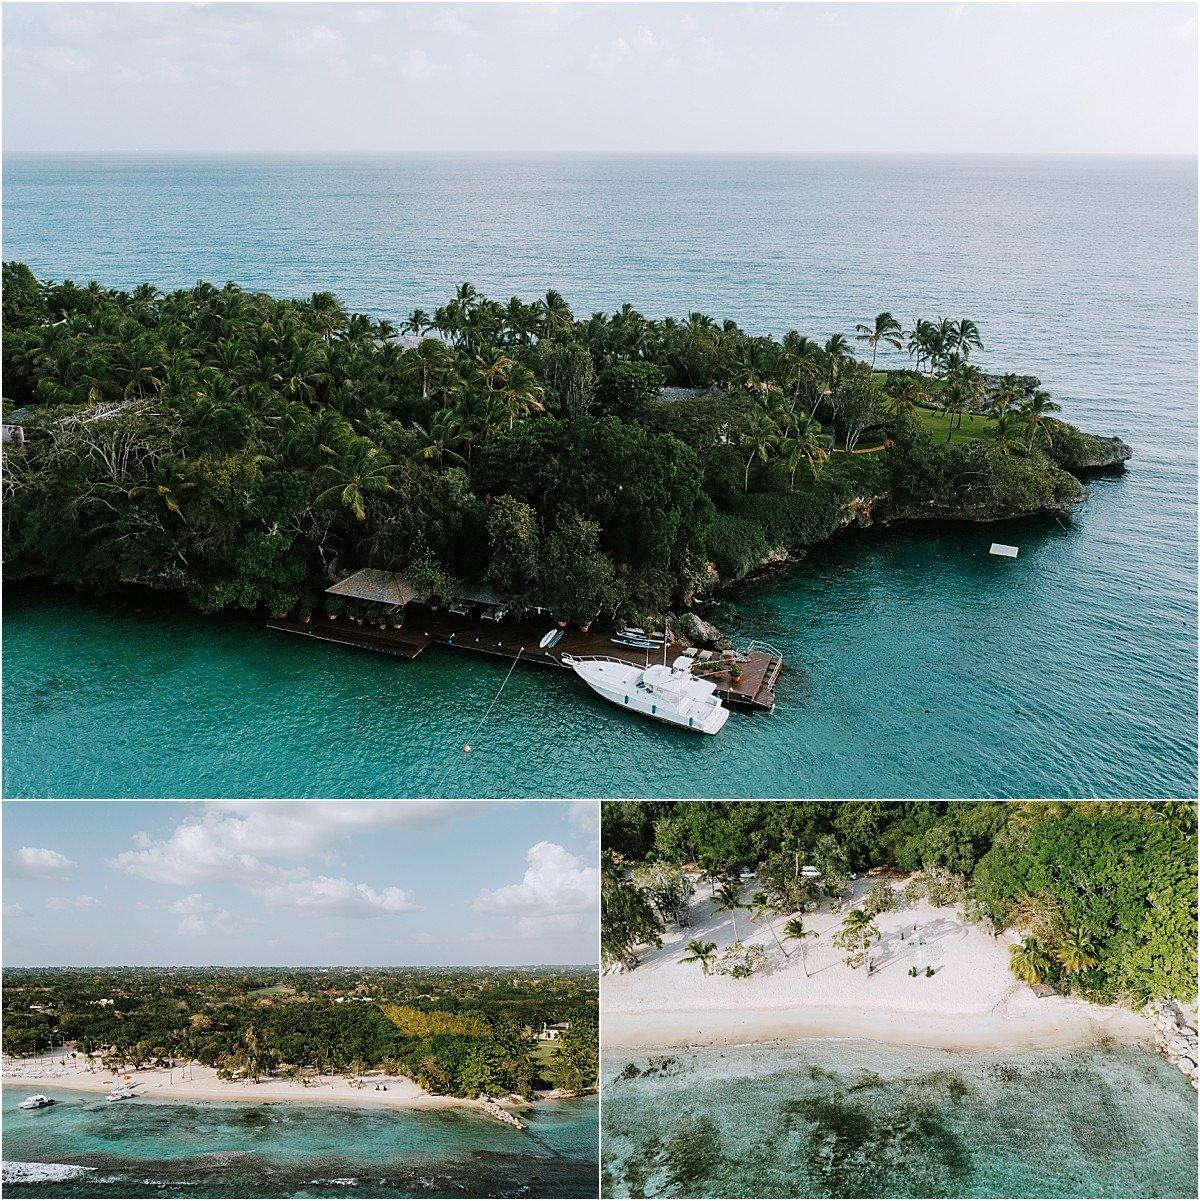 marina view dominican republic blue water